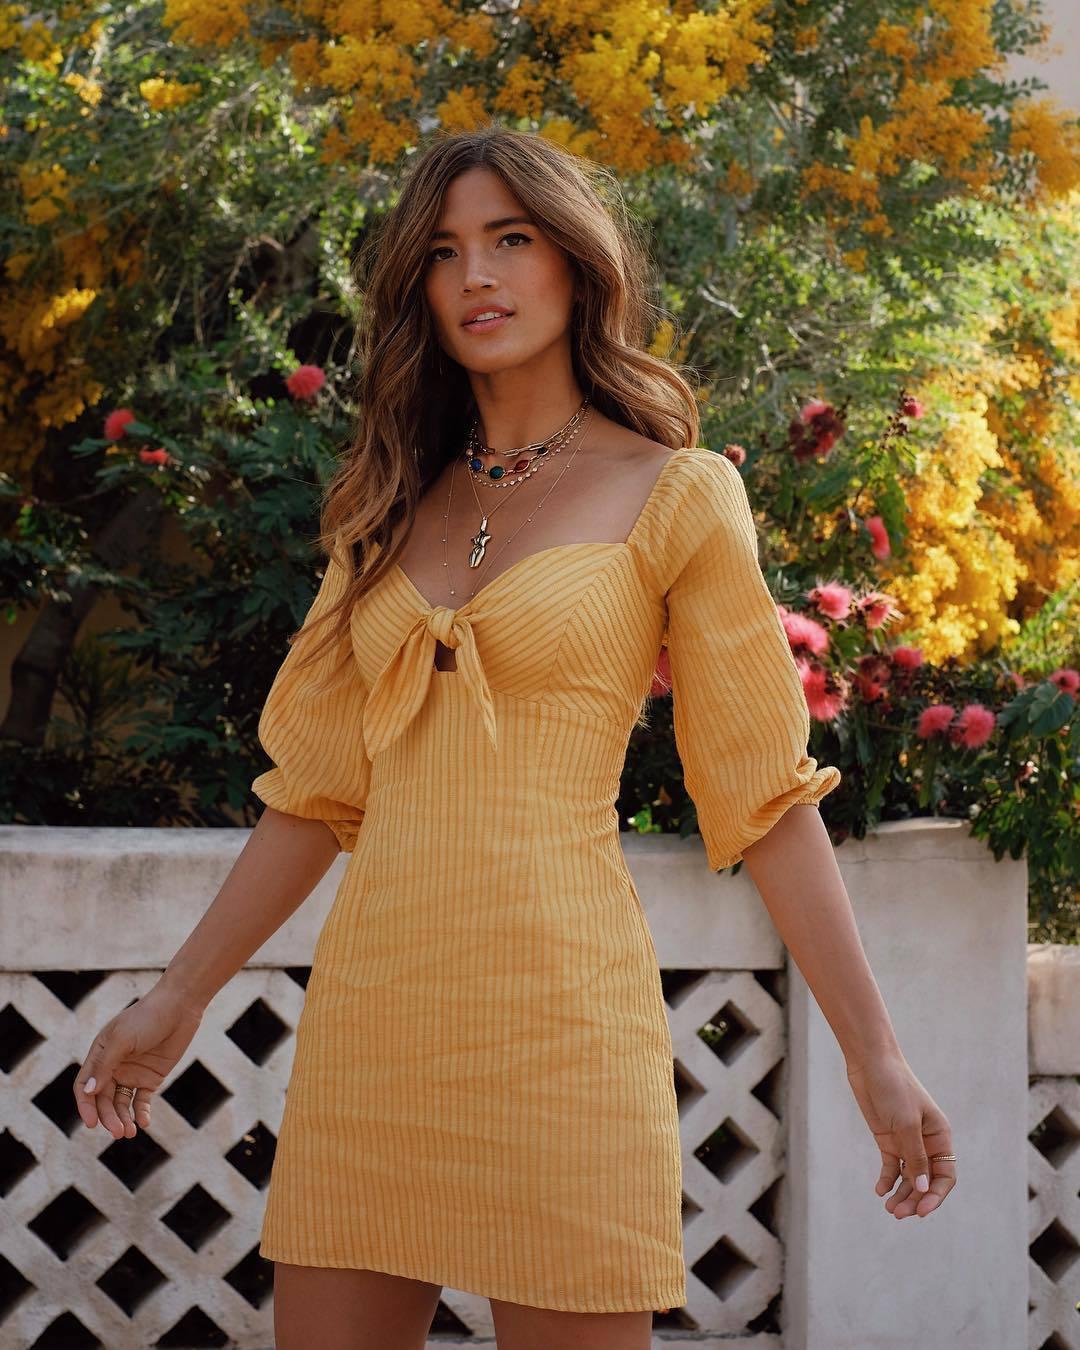 dress yellow yellow dress rocky barnes instagram blogger mini dress